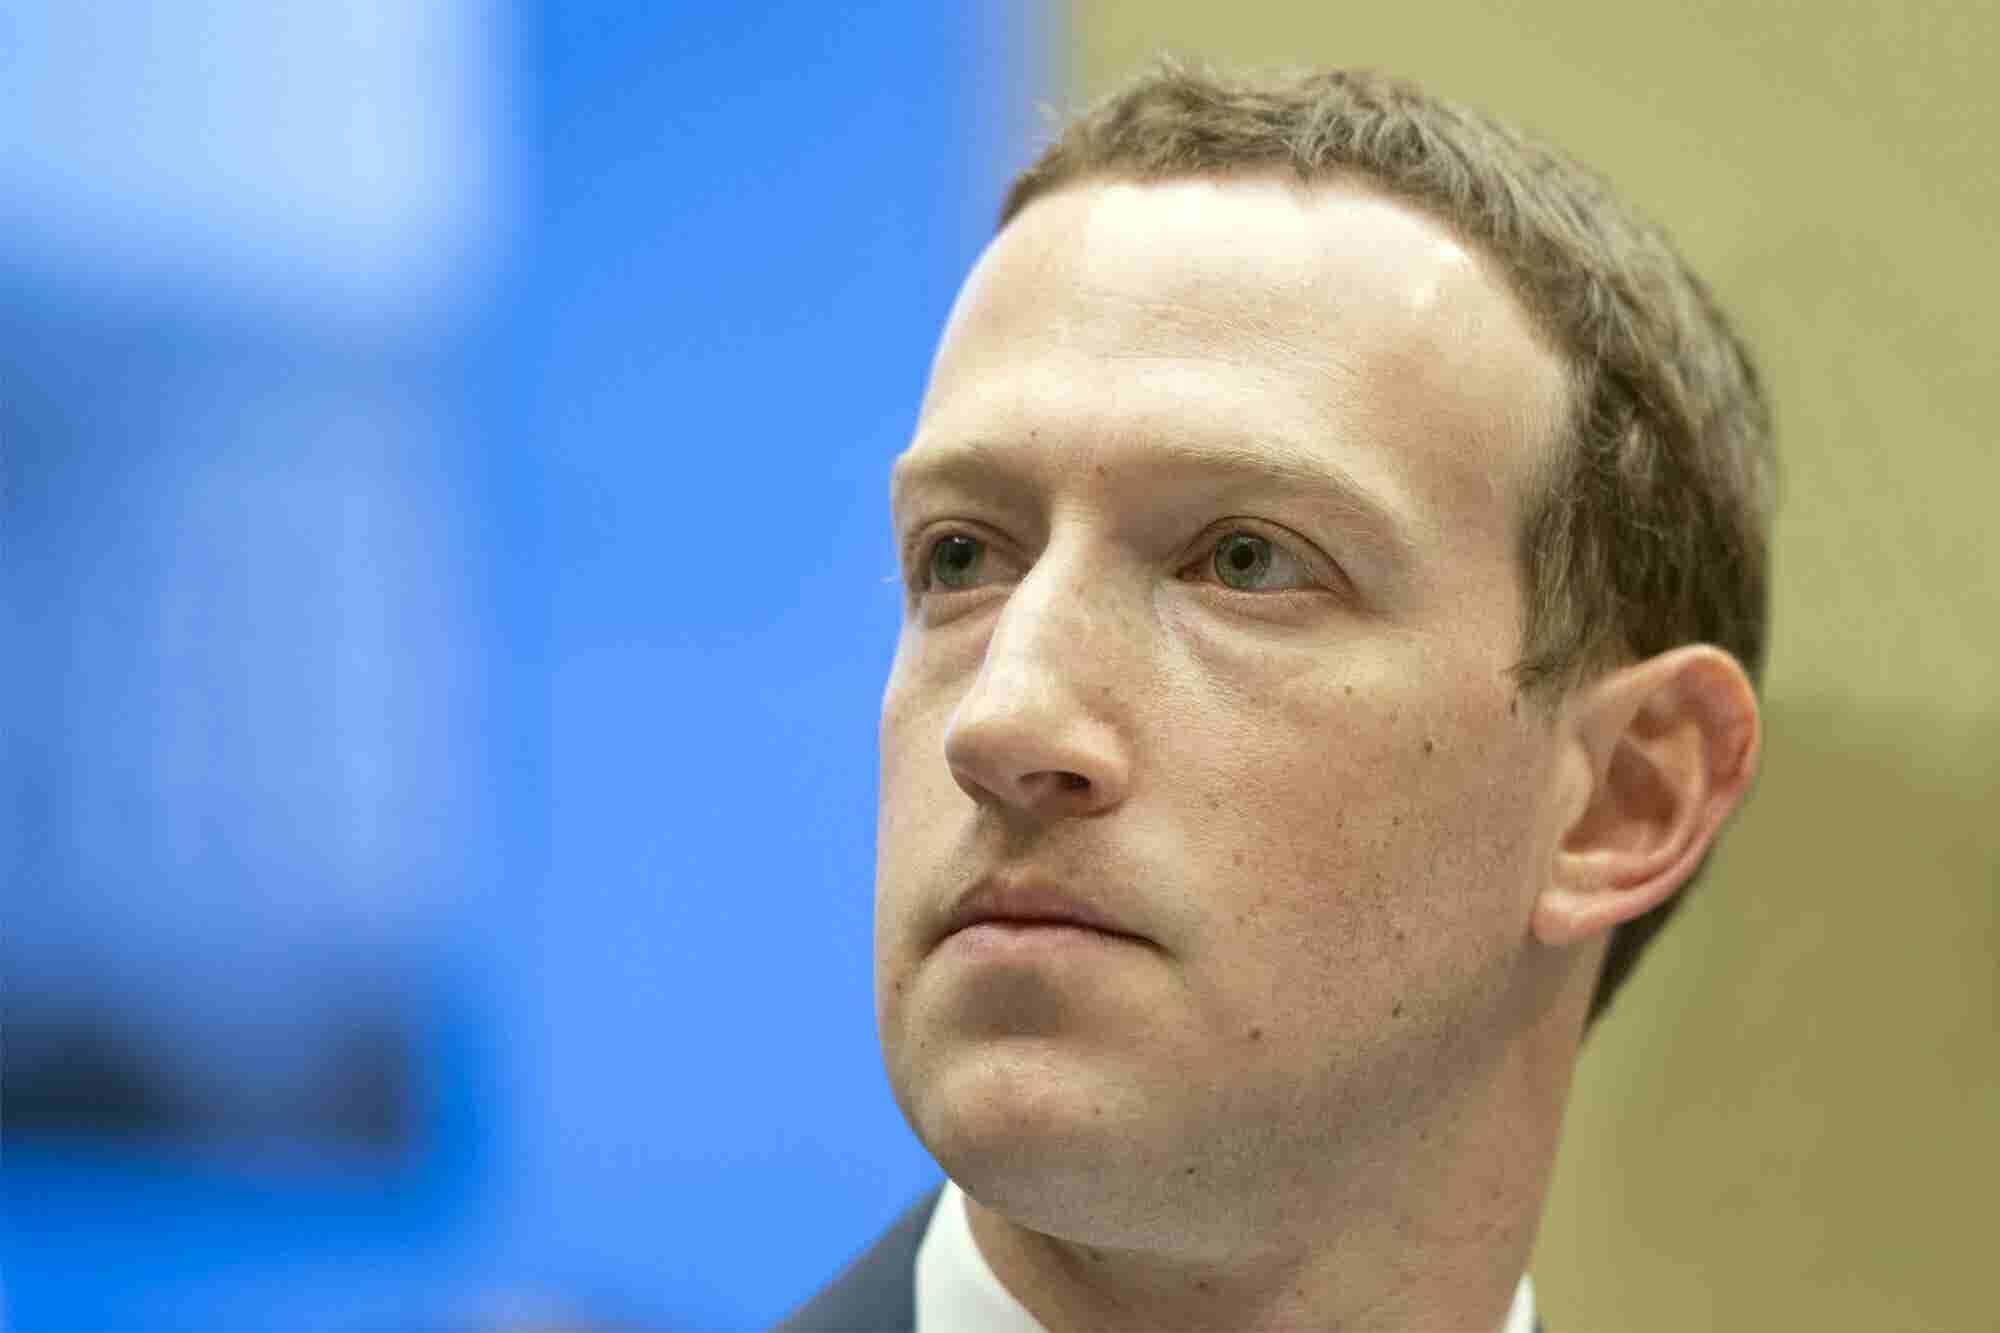 Hacker Says He'll Livestream Deletion of Mark Zuckerberg's Facebook Page